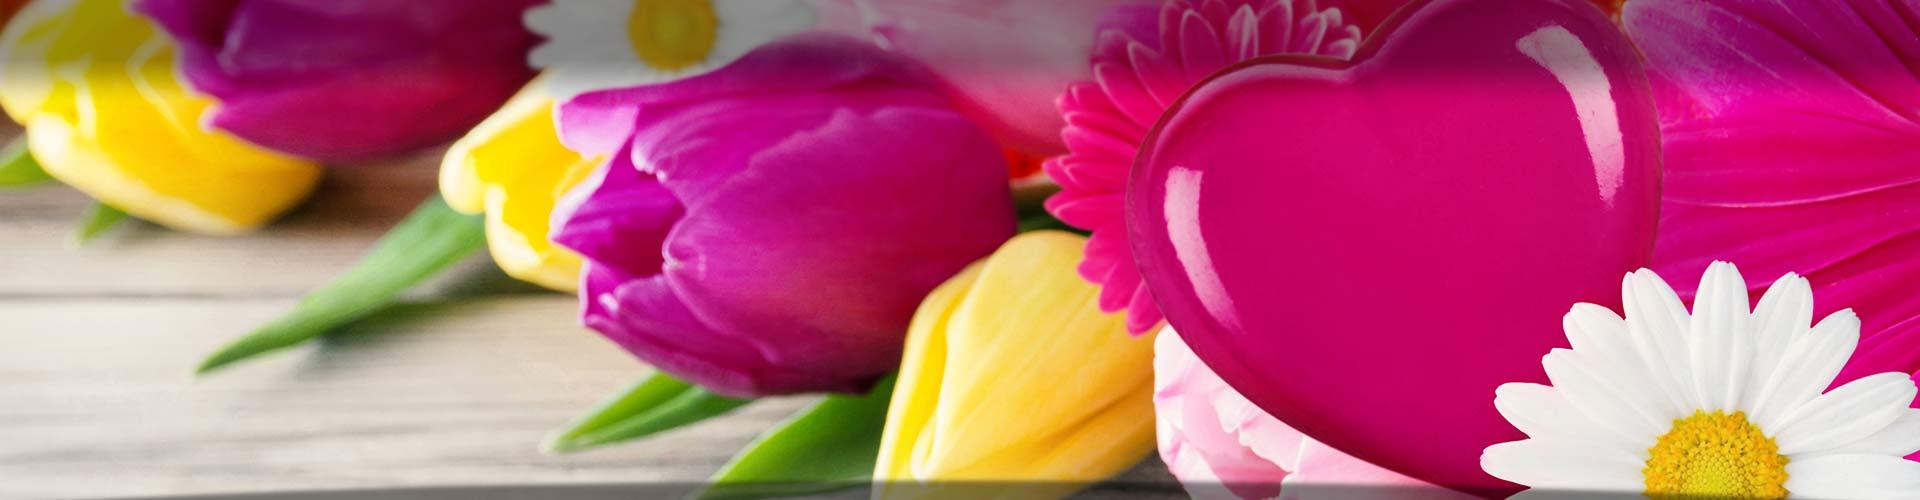 Blumengeschäft Bottrop - Blütenecht